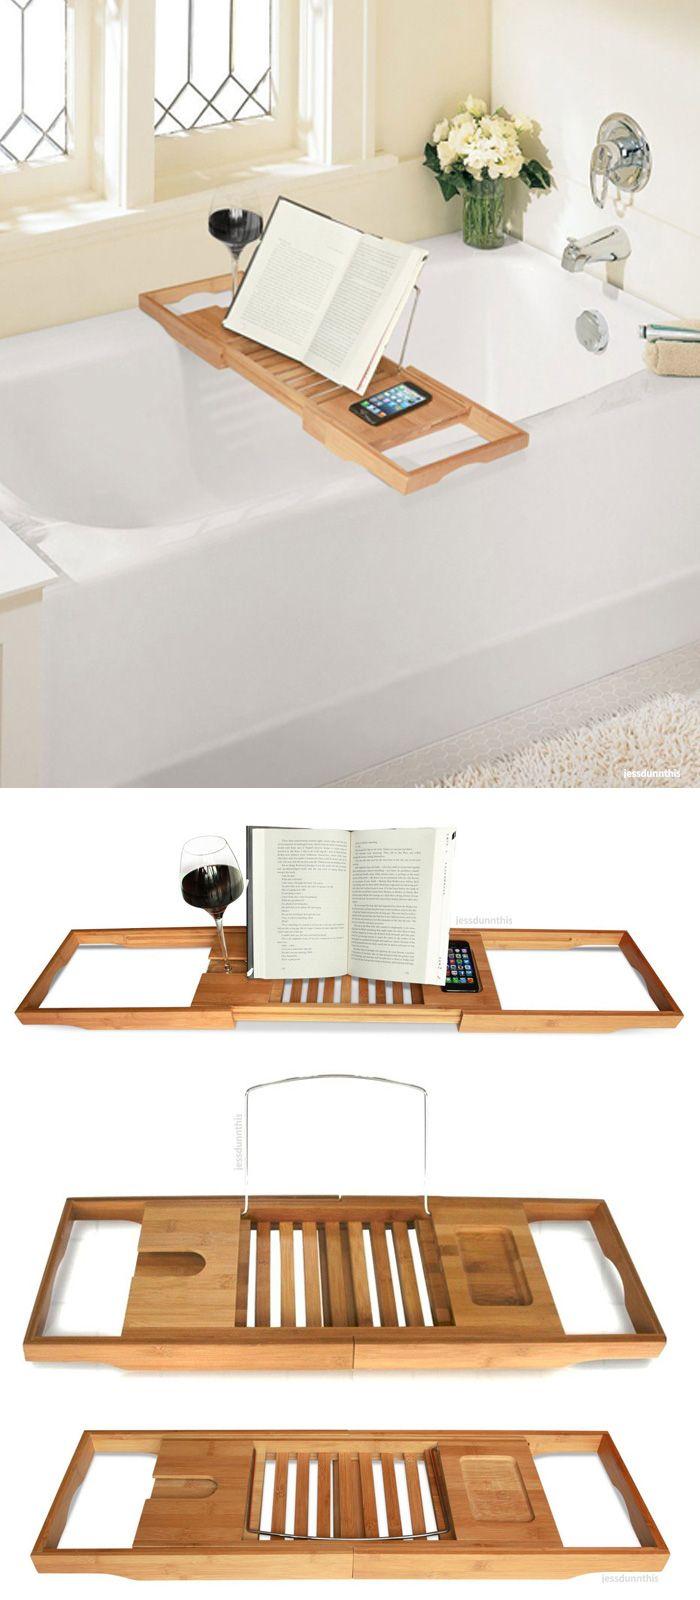 Expandable U0026 Adjustable Bath Caddy Fits On Any Tub! #product_design